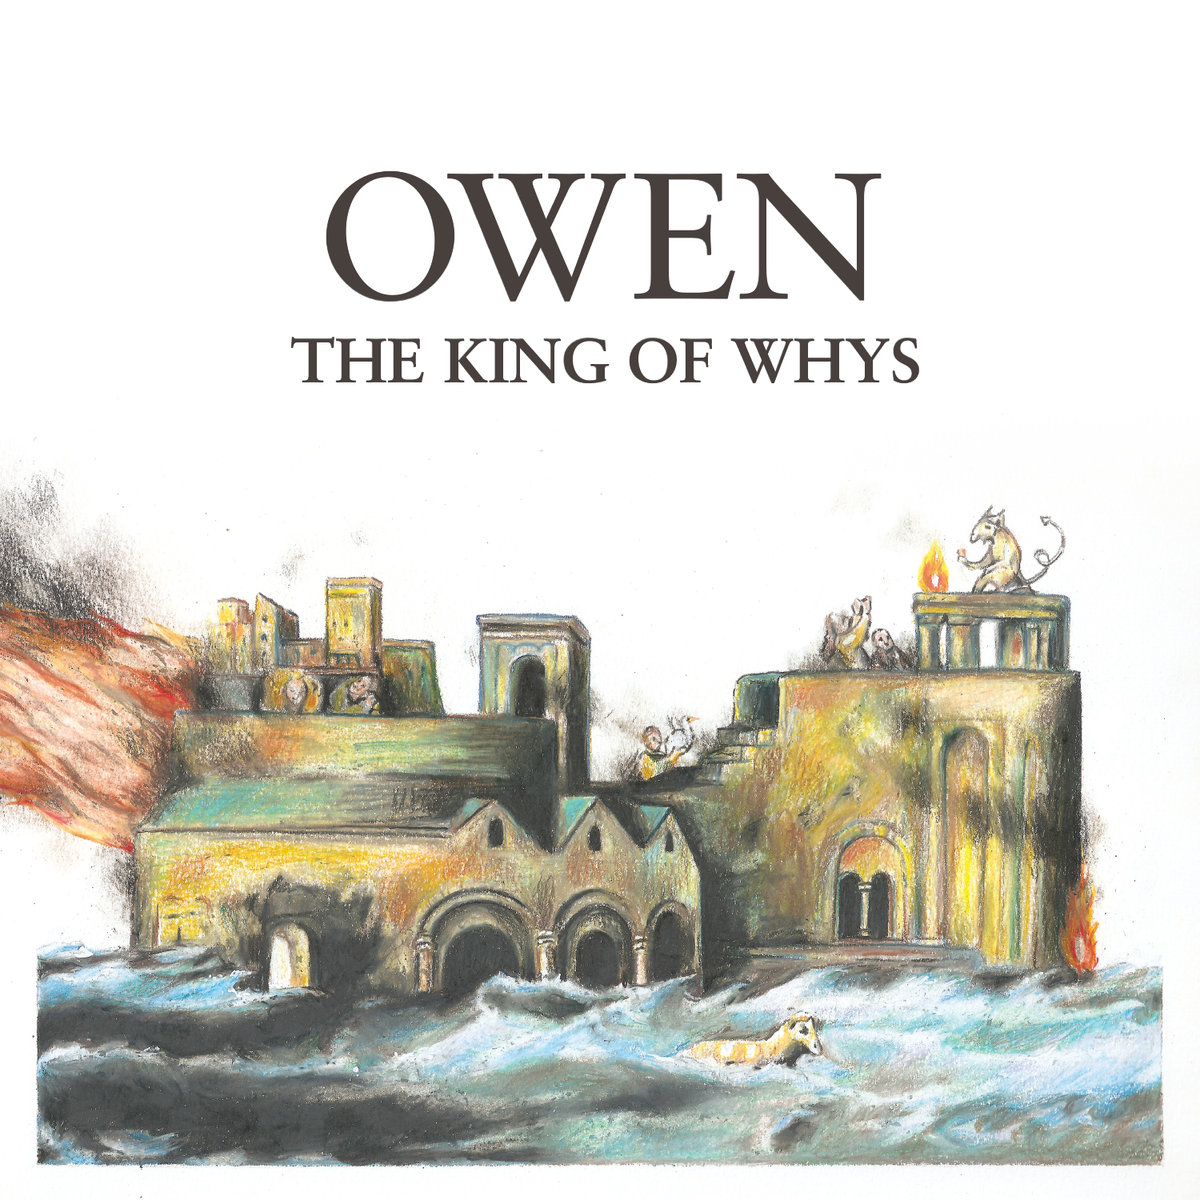 Owen 27.07.2016ANDREW